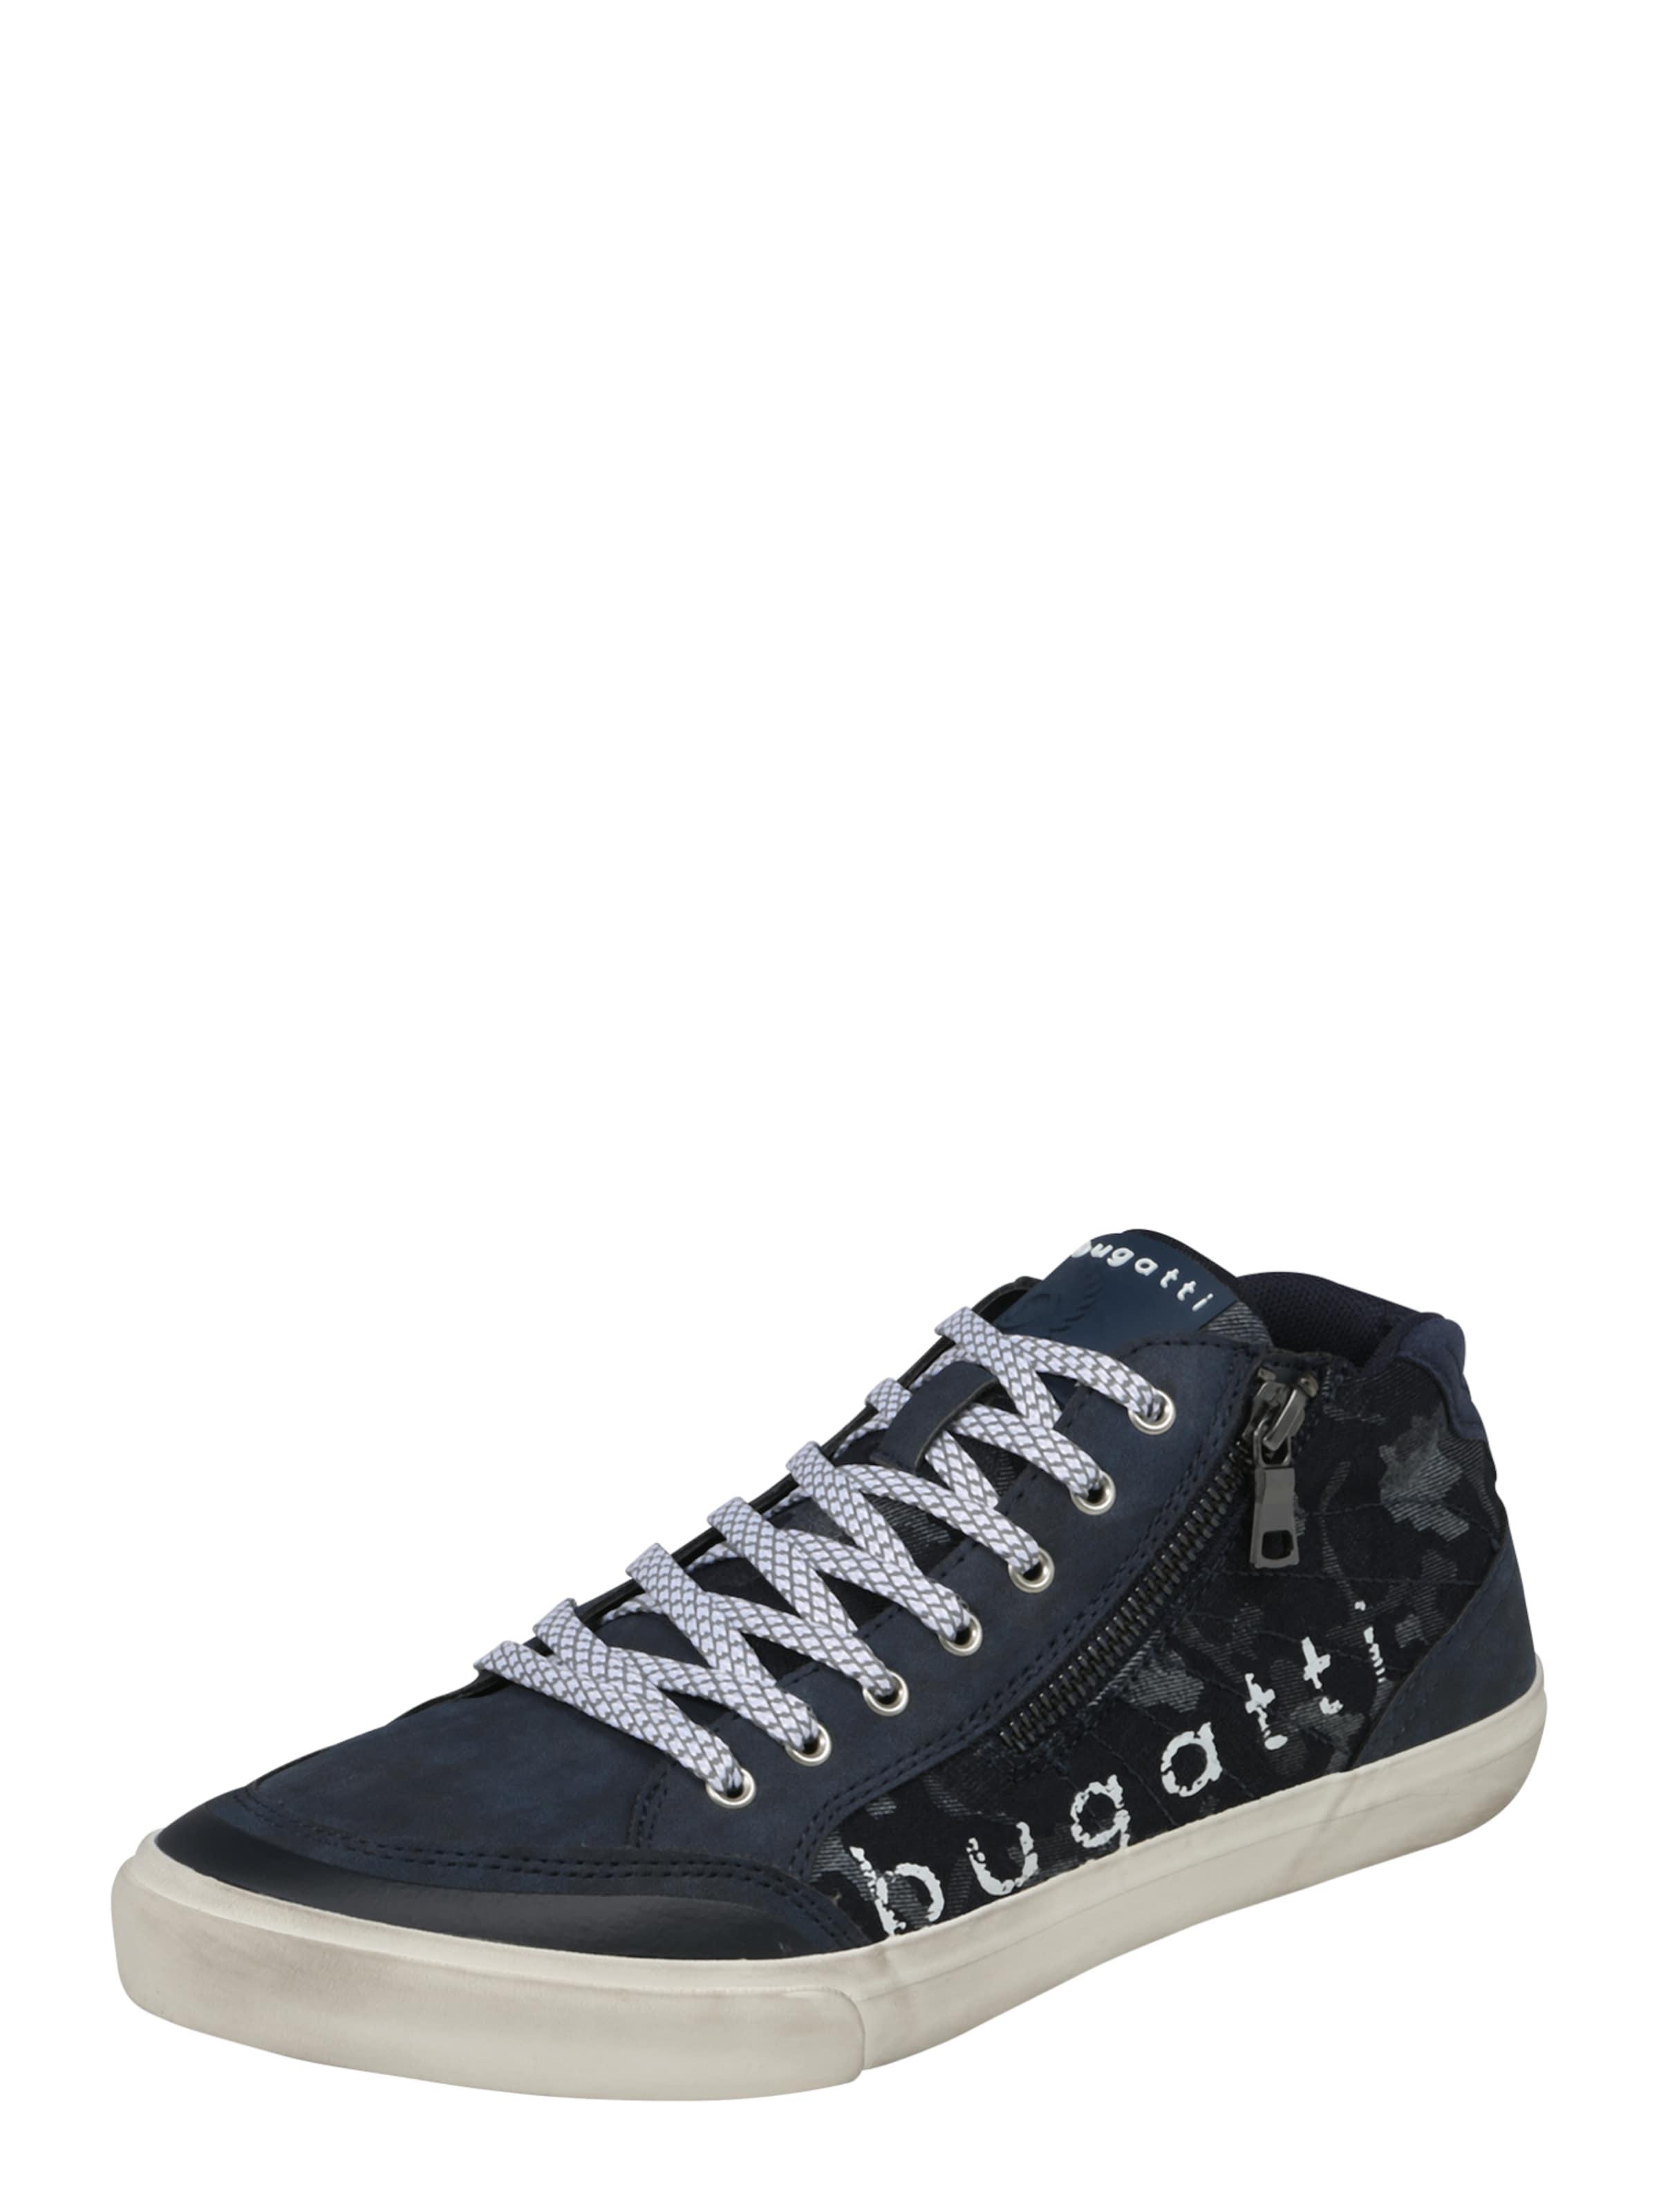 bugatti Sneaker Mahalo Verschleißfeste billige Schuhe